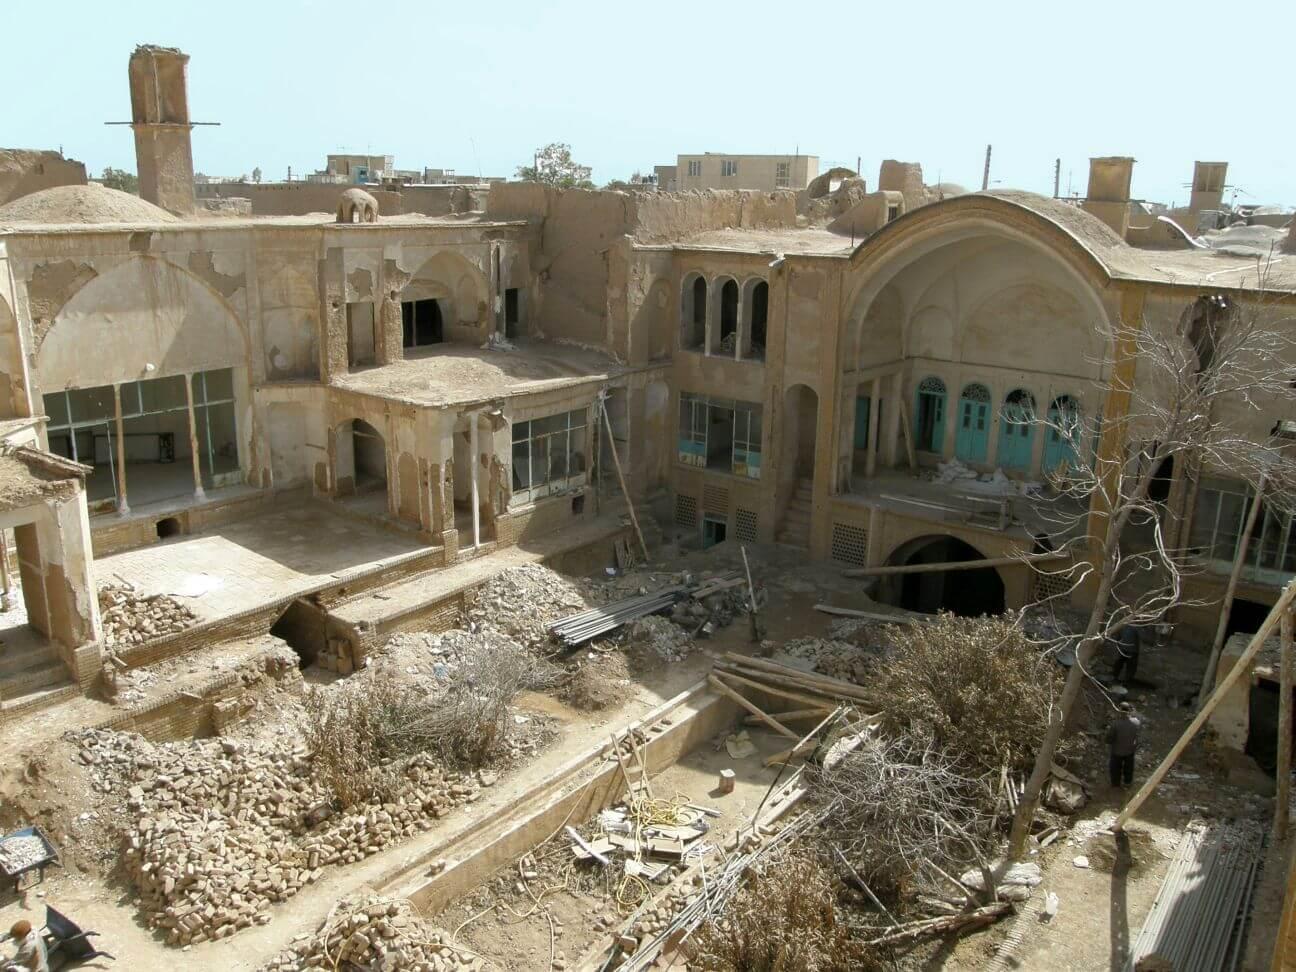 Upper view of Manouchehri house before renovation